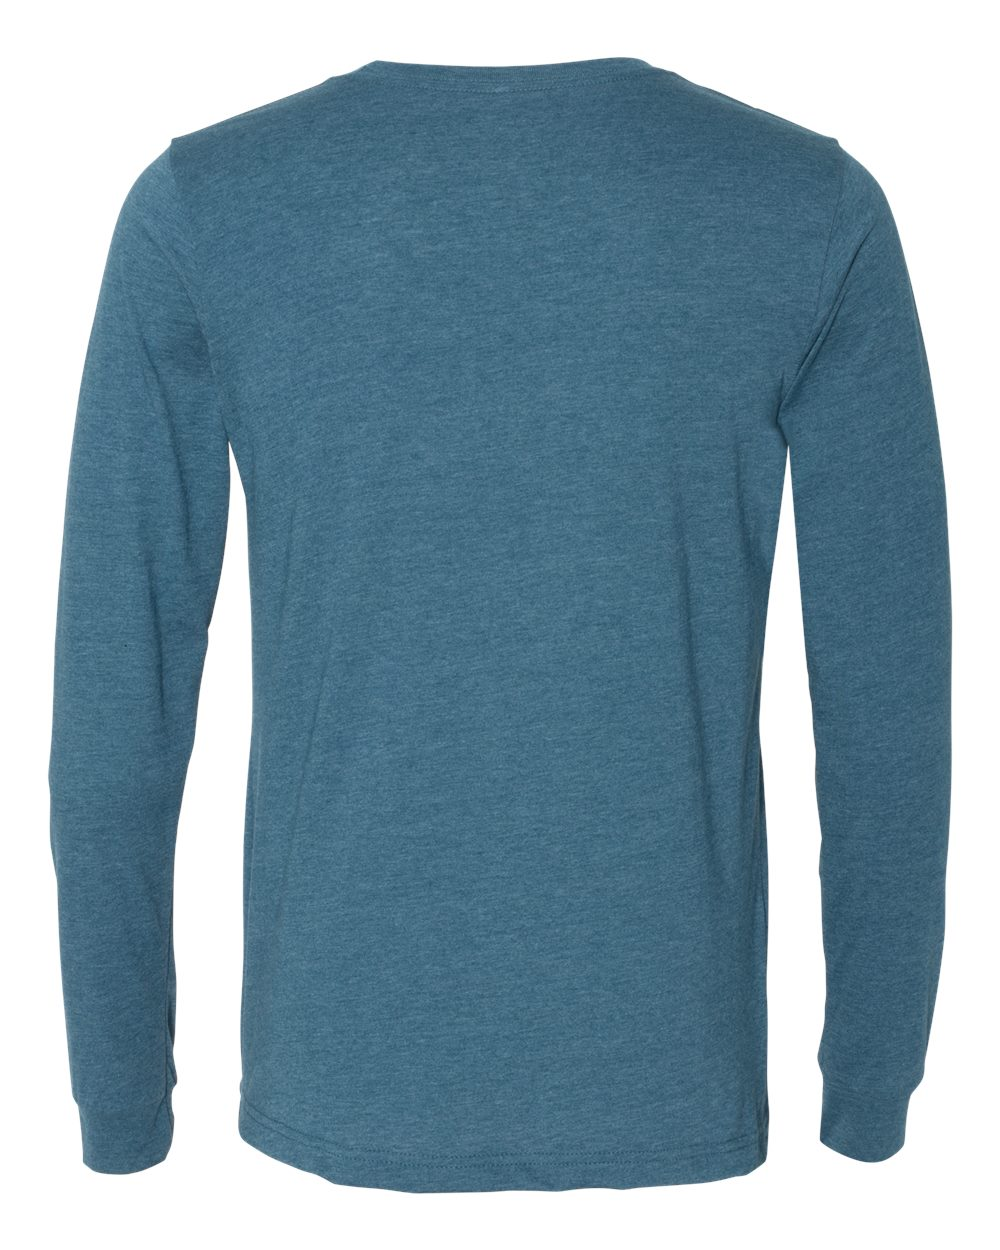 Bella-Canvas-Mens-Blank-Top-Long-Sleeve-Jersey-Tee-T-Shirt-3501-up-to-3XL thumbnail 59